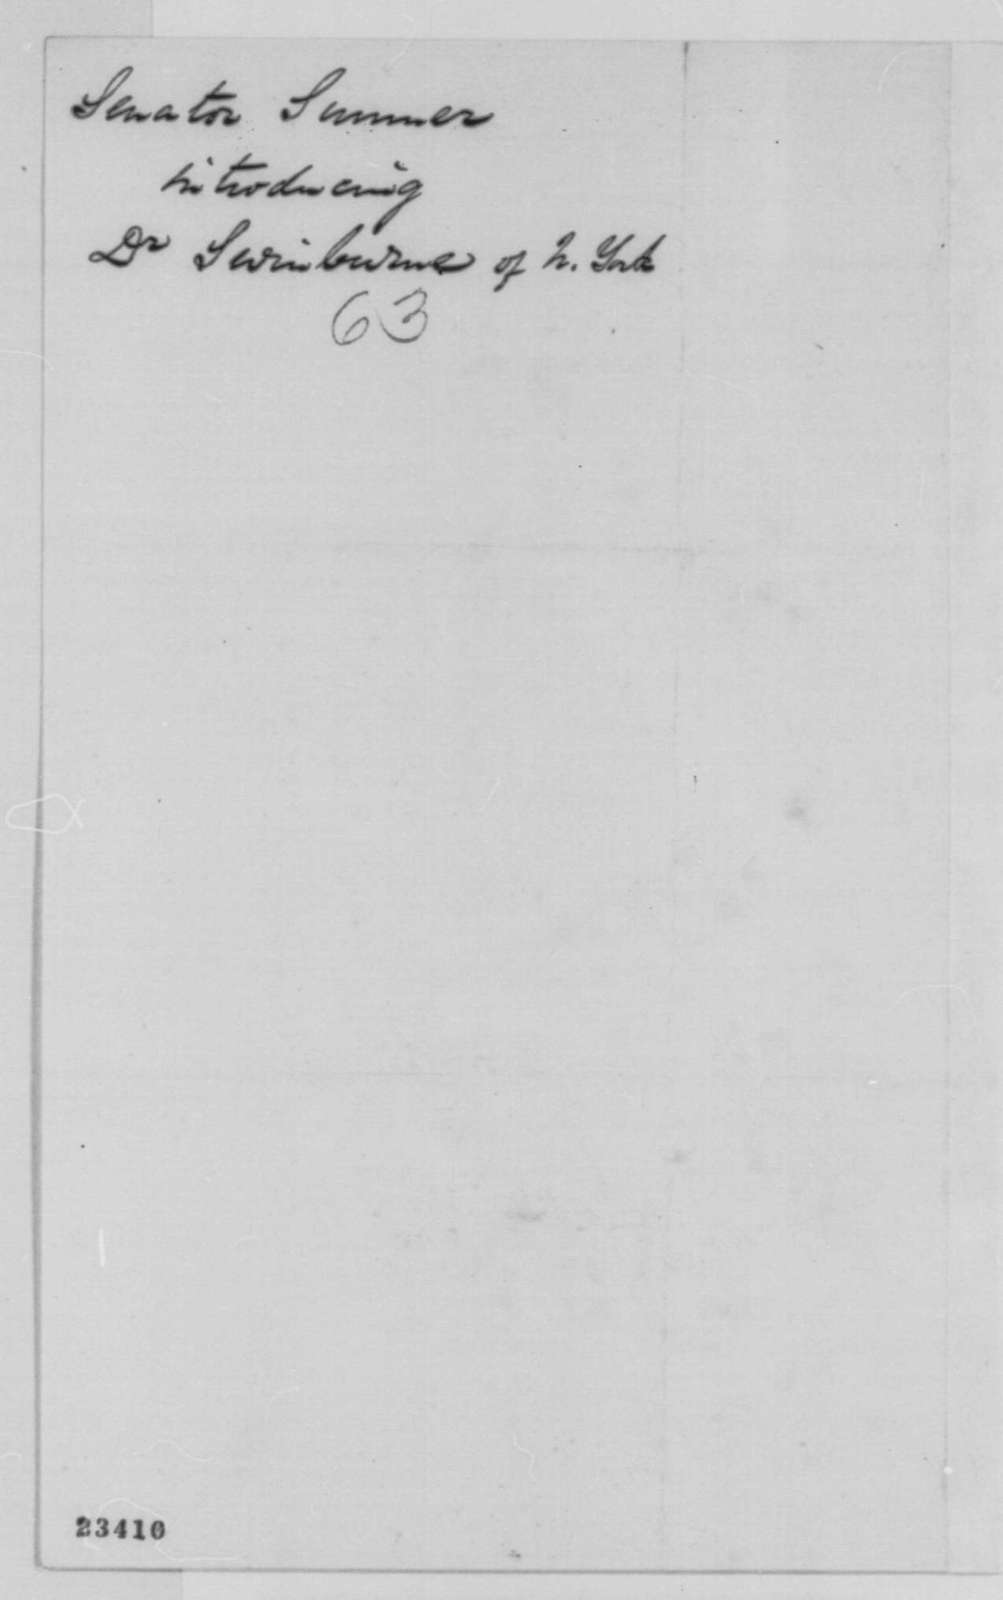 Charles Sumner to Abraham Lincoln, Sunday, May 10, 1863  (Writes on behalf of Dr. Swinburne)